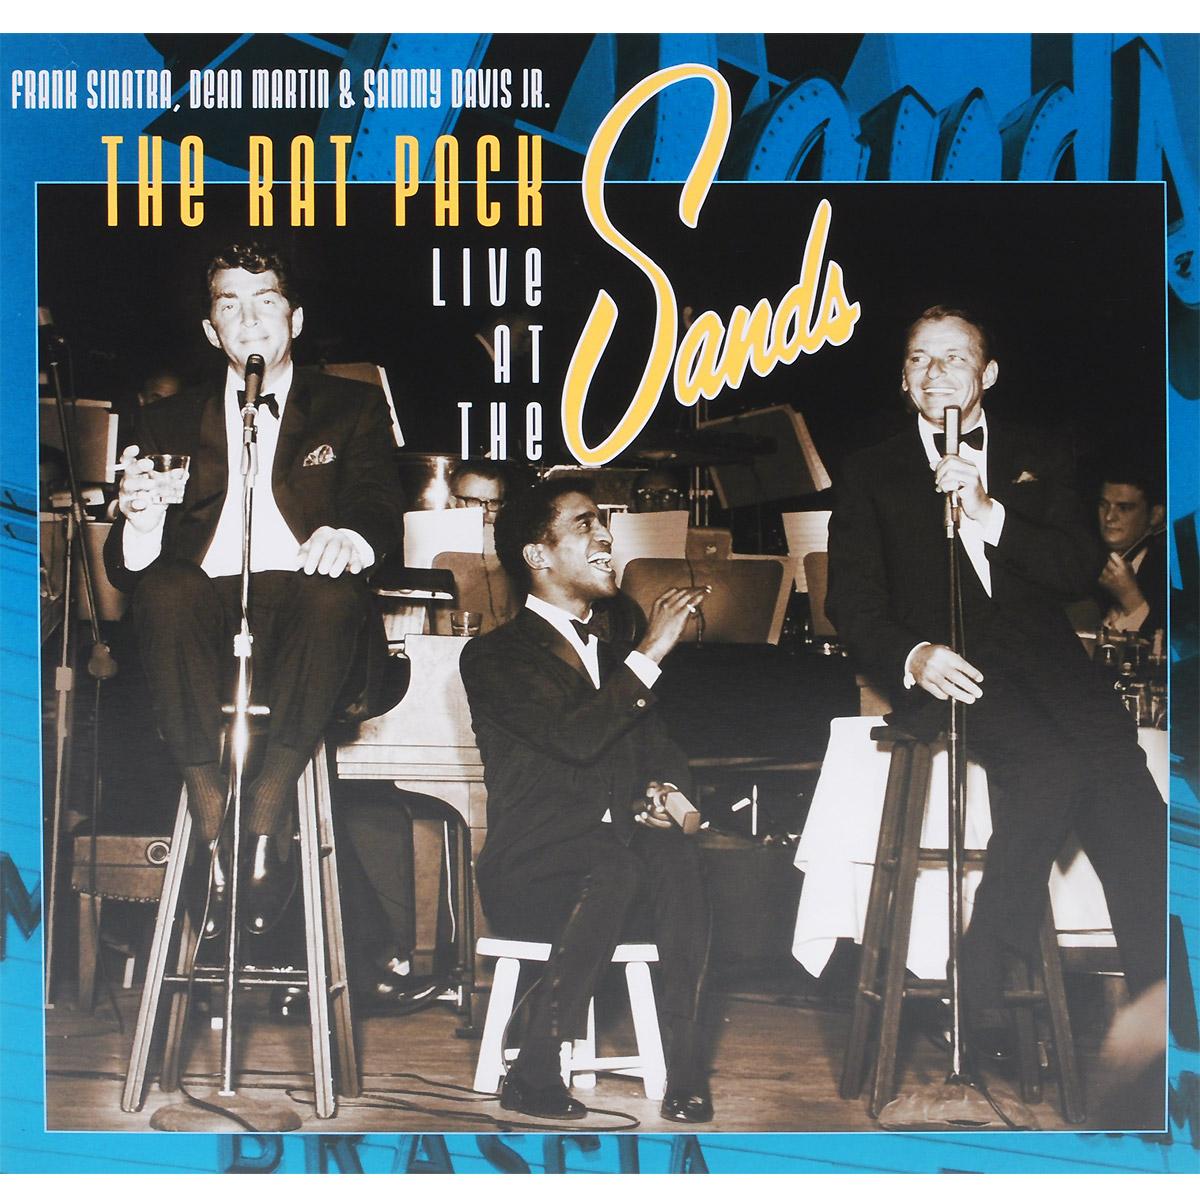 Frank Sinatra, Dean Martin & Sammy Davis Jr. The Rat Pack Live At The Sands (2 LP) frank sinatra frank sinatra live at the sands 2 lp 180 gr